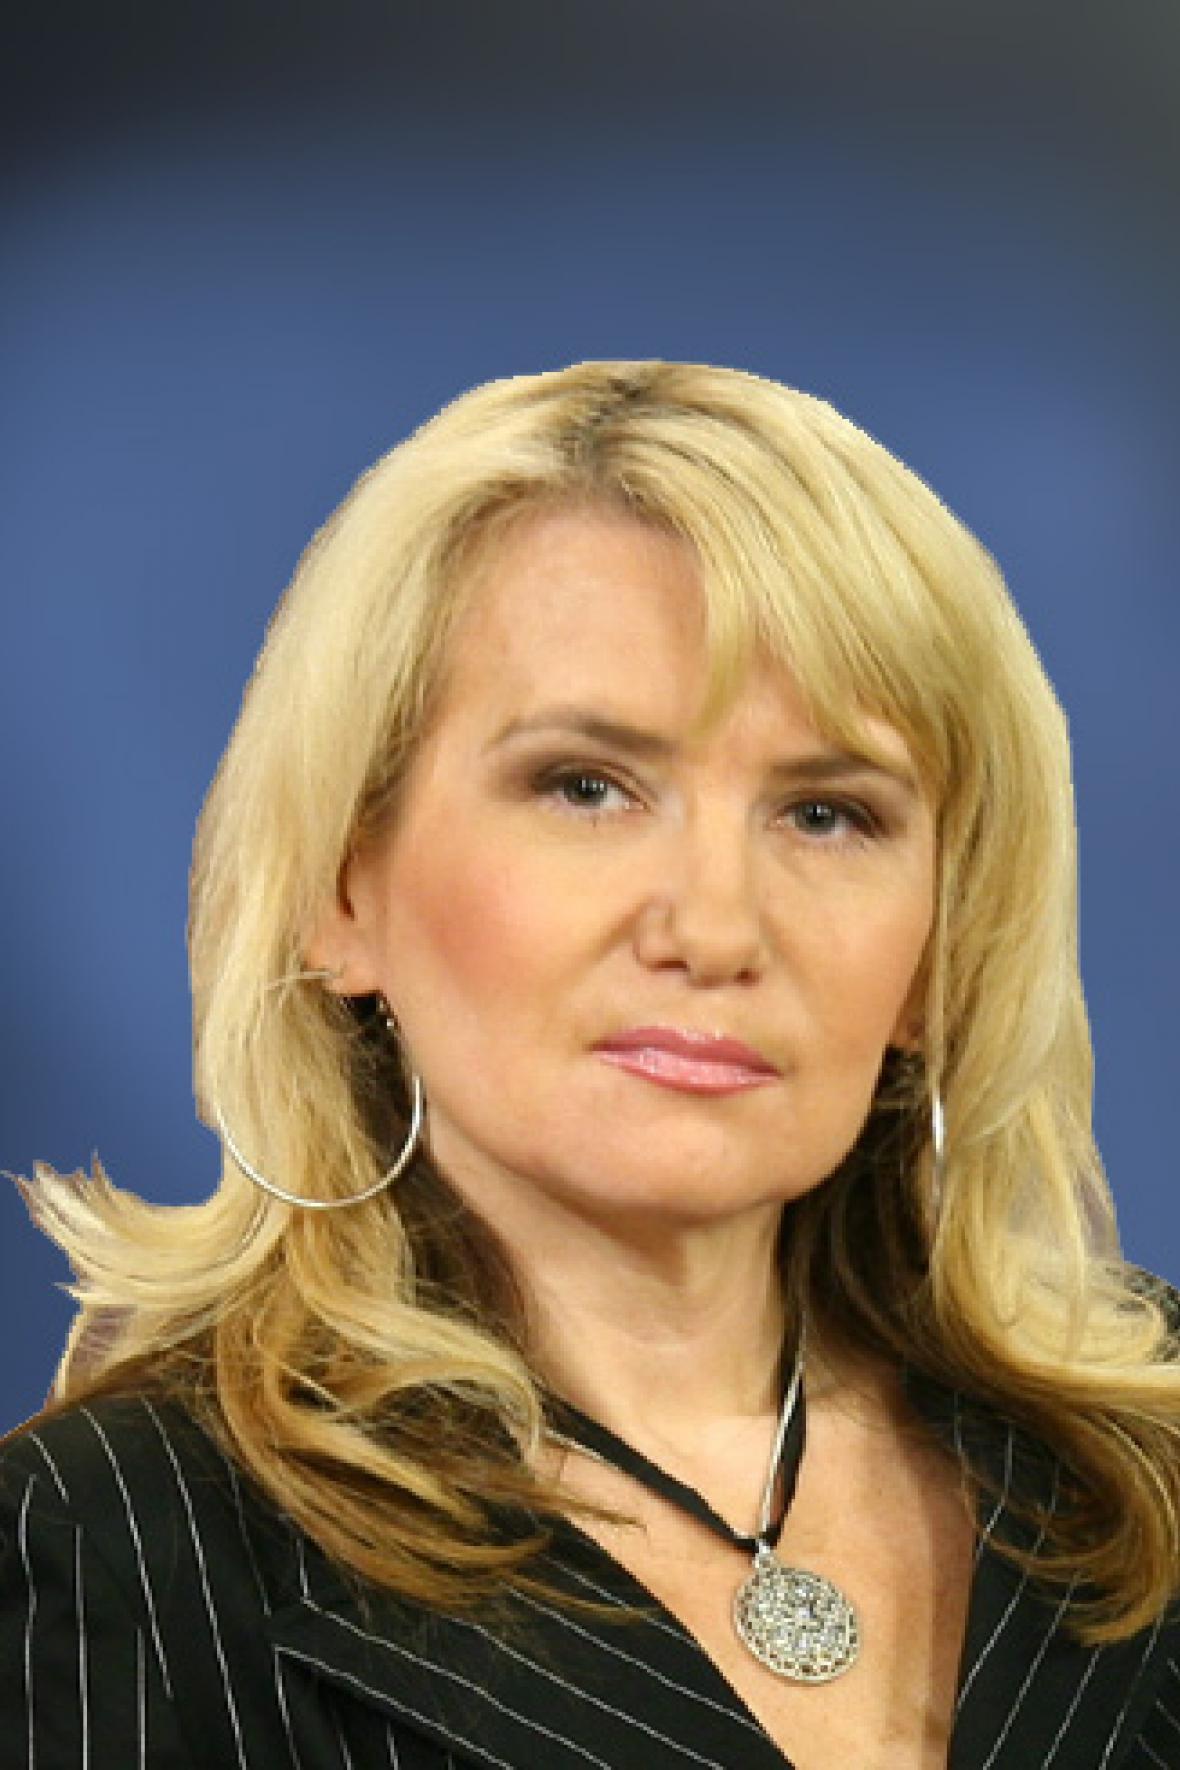 Šárka Bednářová